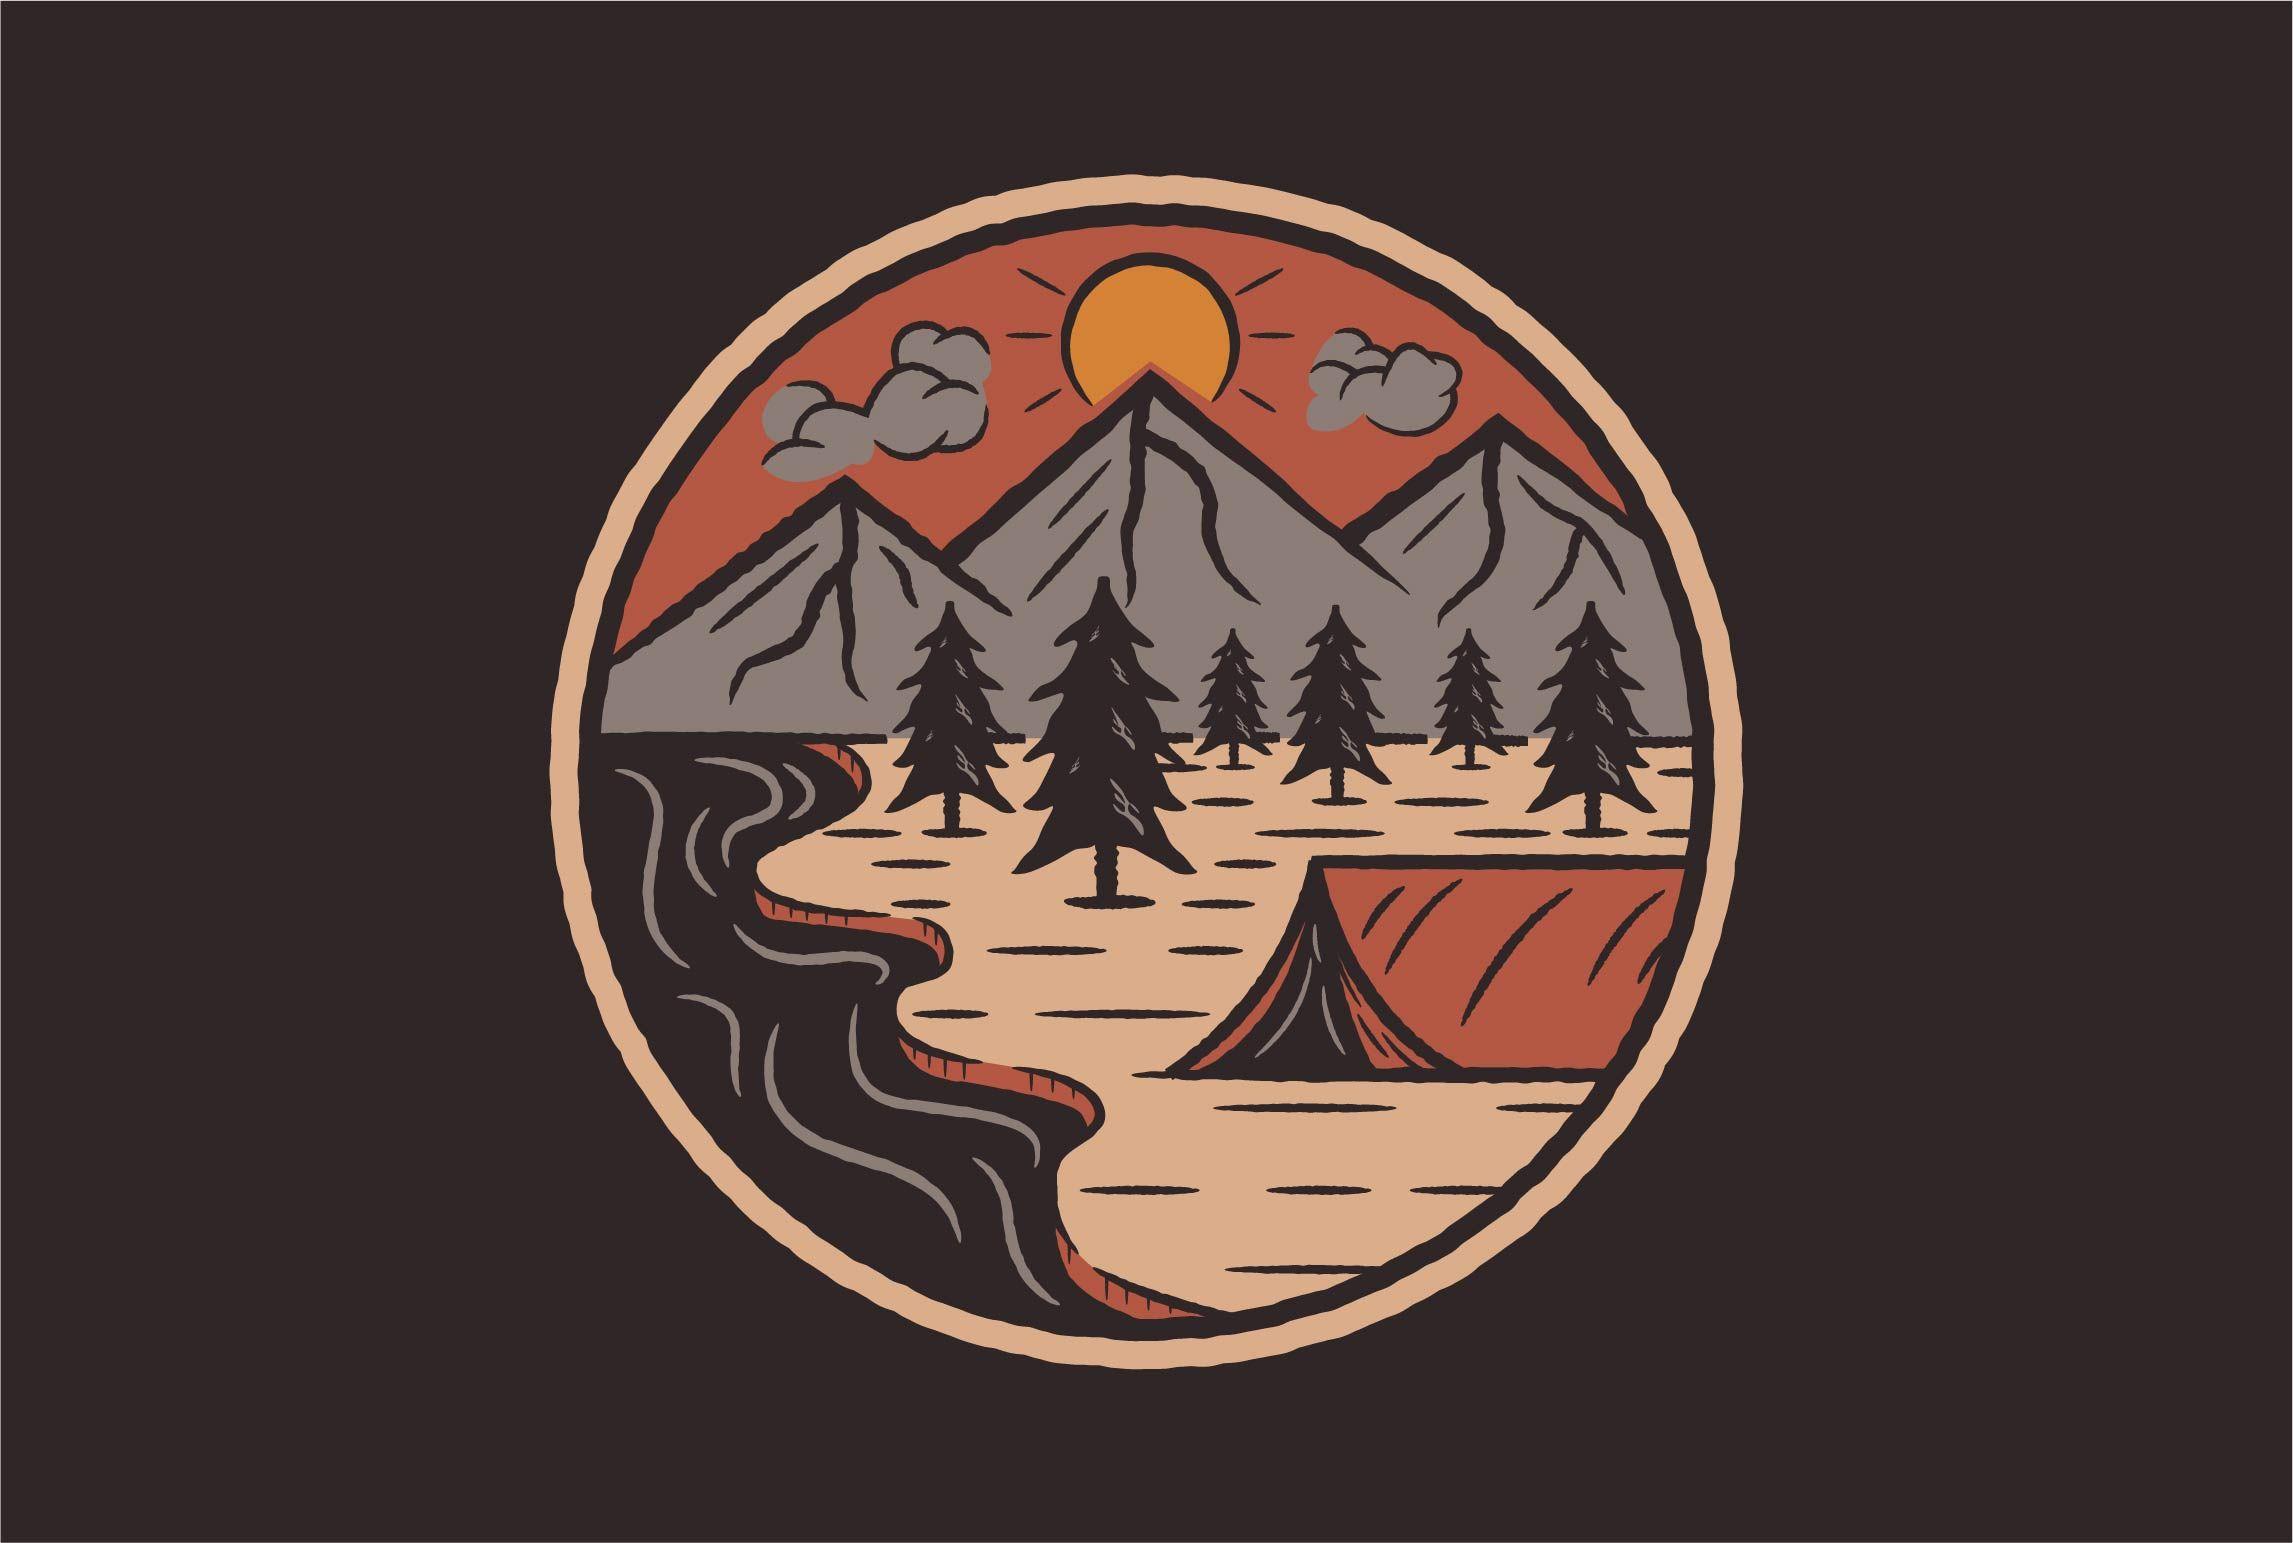 mhudasyahronie I will design vintage outdoor logo design